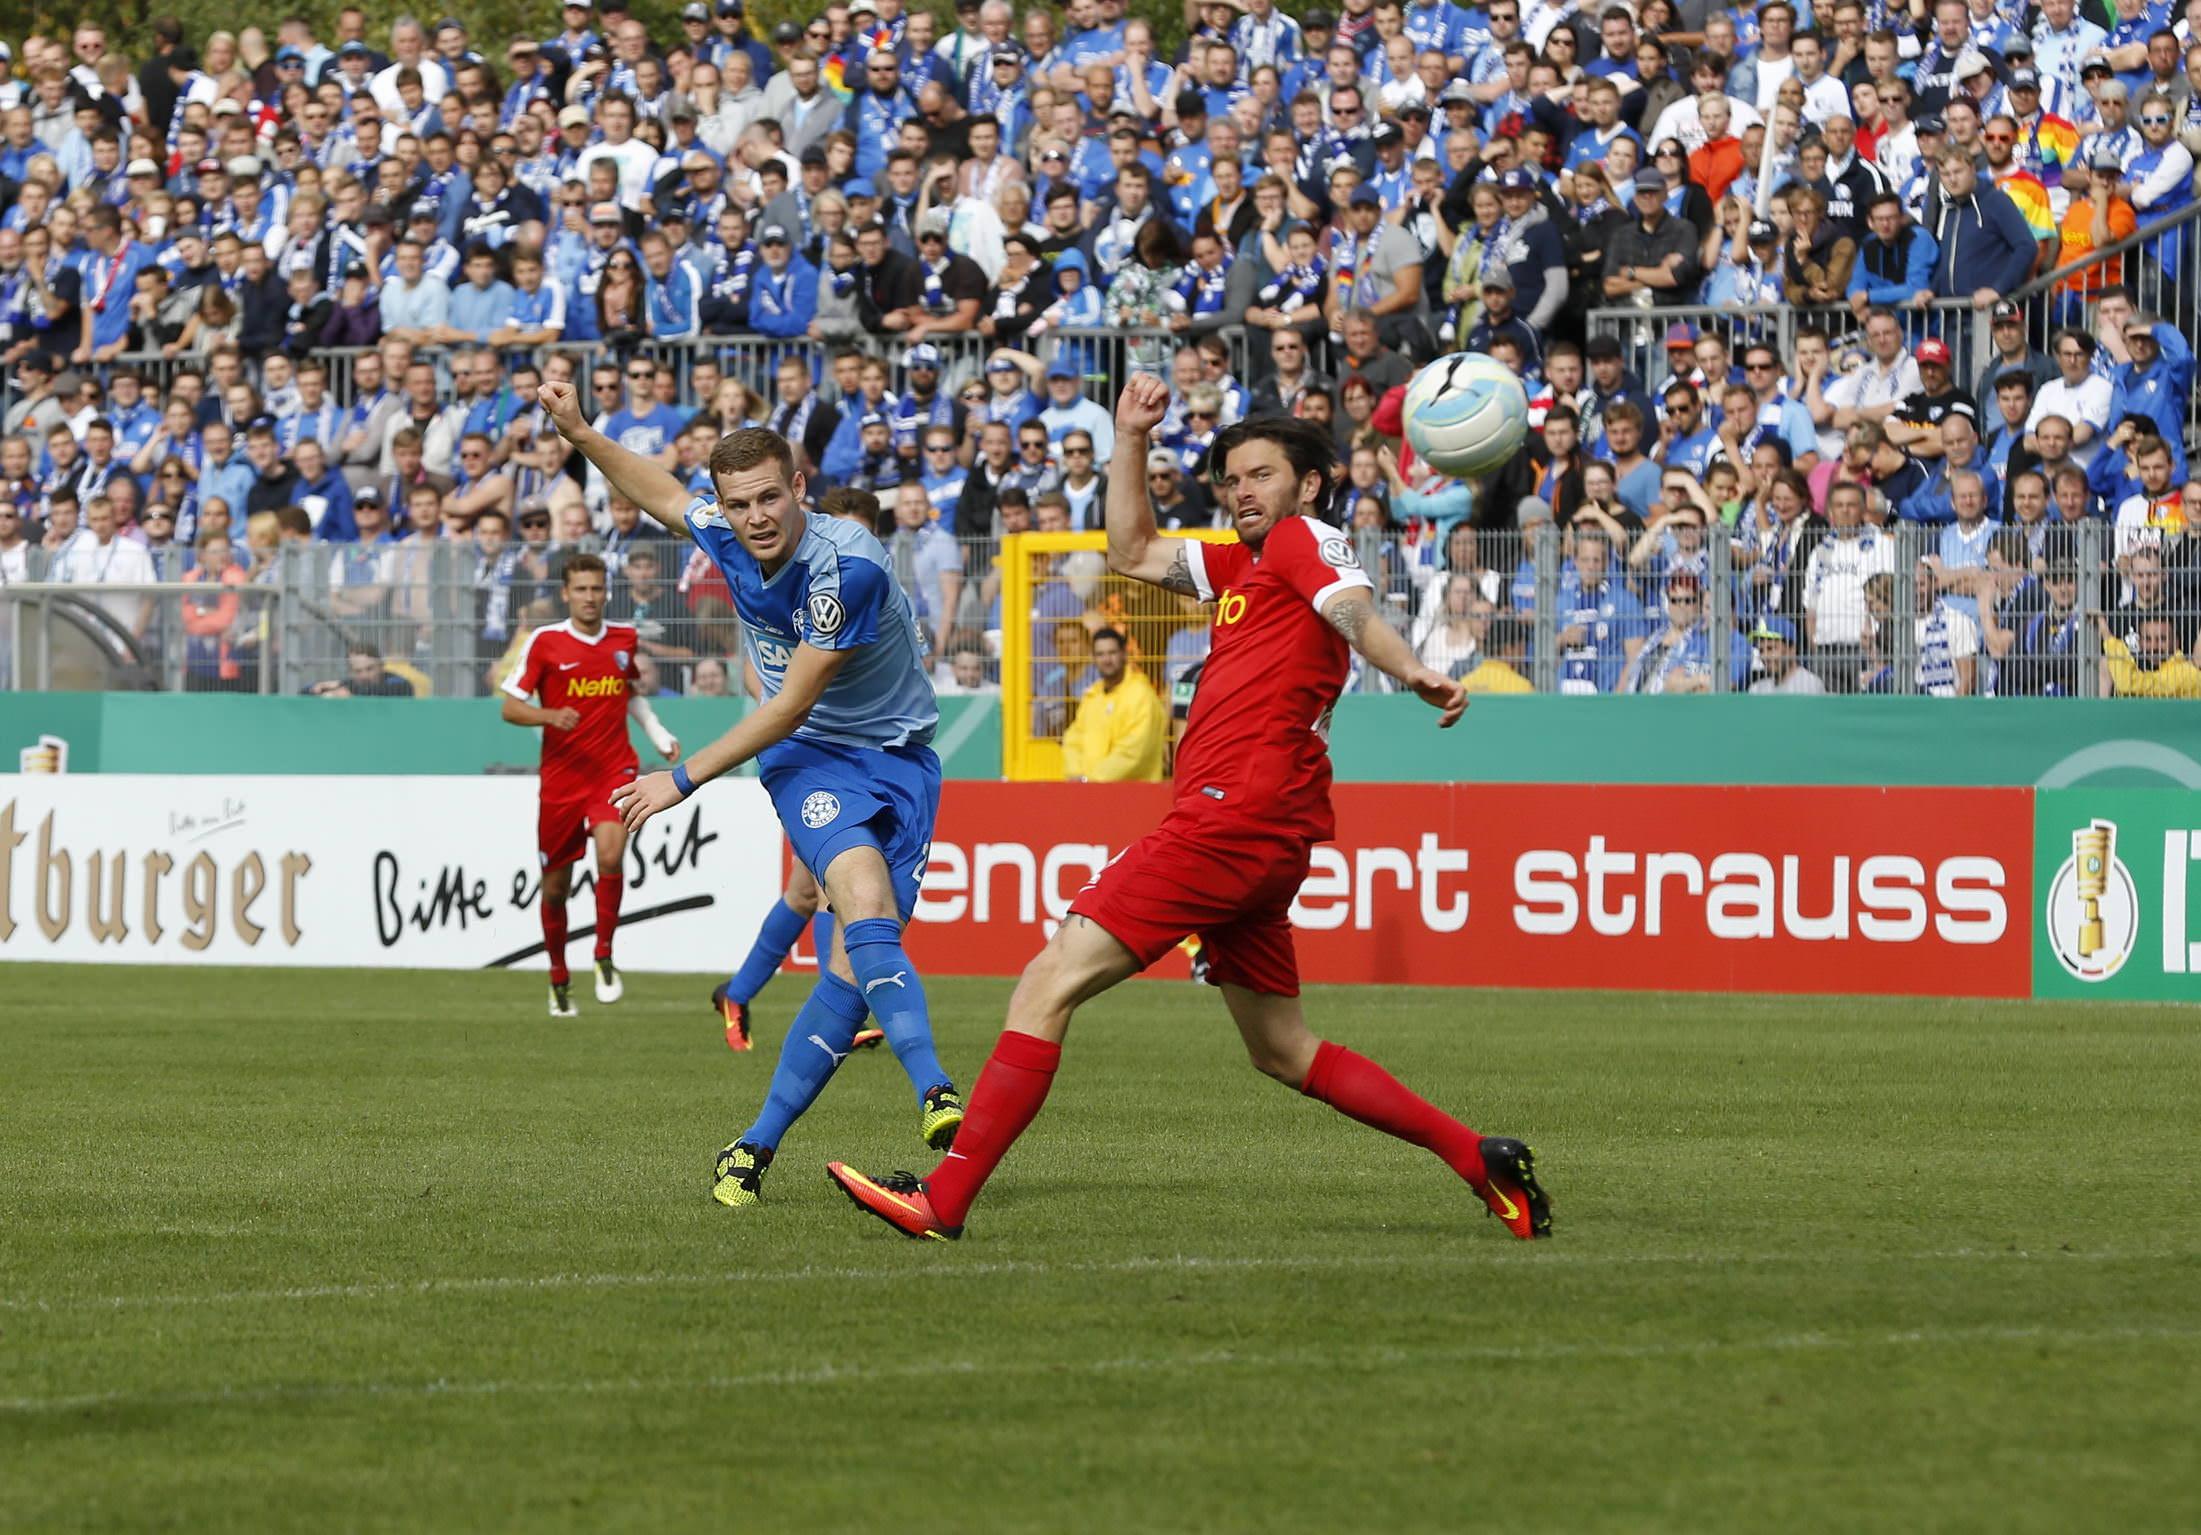 Fussball. DFB-Pokal, 2016-2017, 1. Runde. FC Astoria Walldorf - VfL Bochum. Tor zum 2:1 durch Marcel Carl (FCA Walldorf). 08.2016 - Jan A. Pfeifer - 01726290959